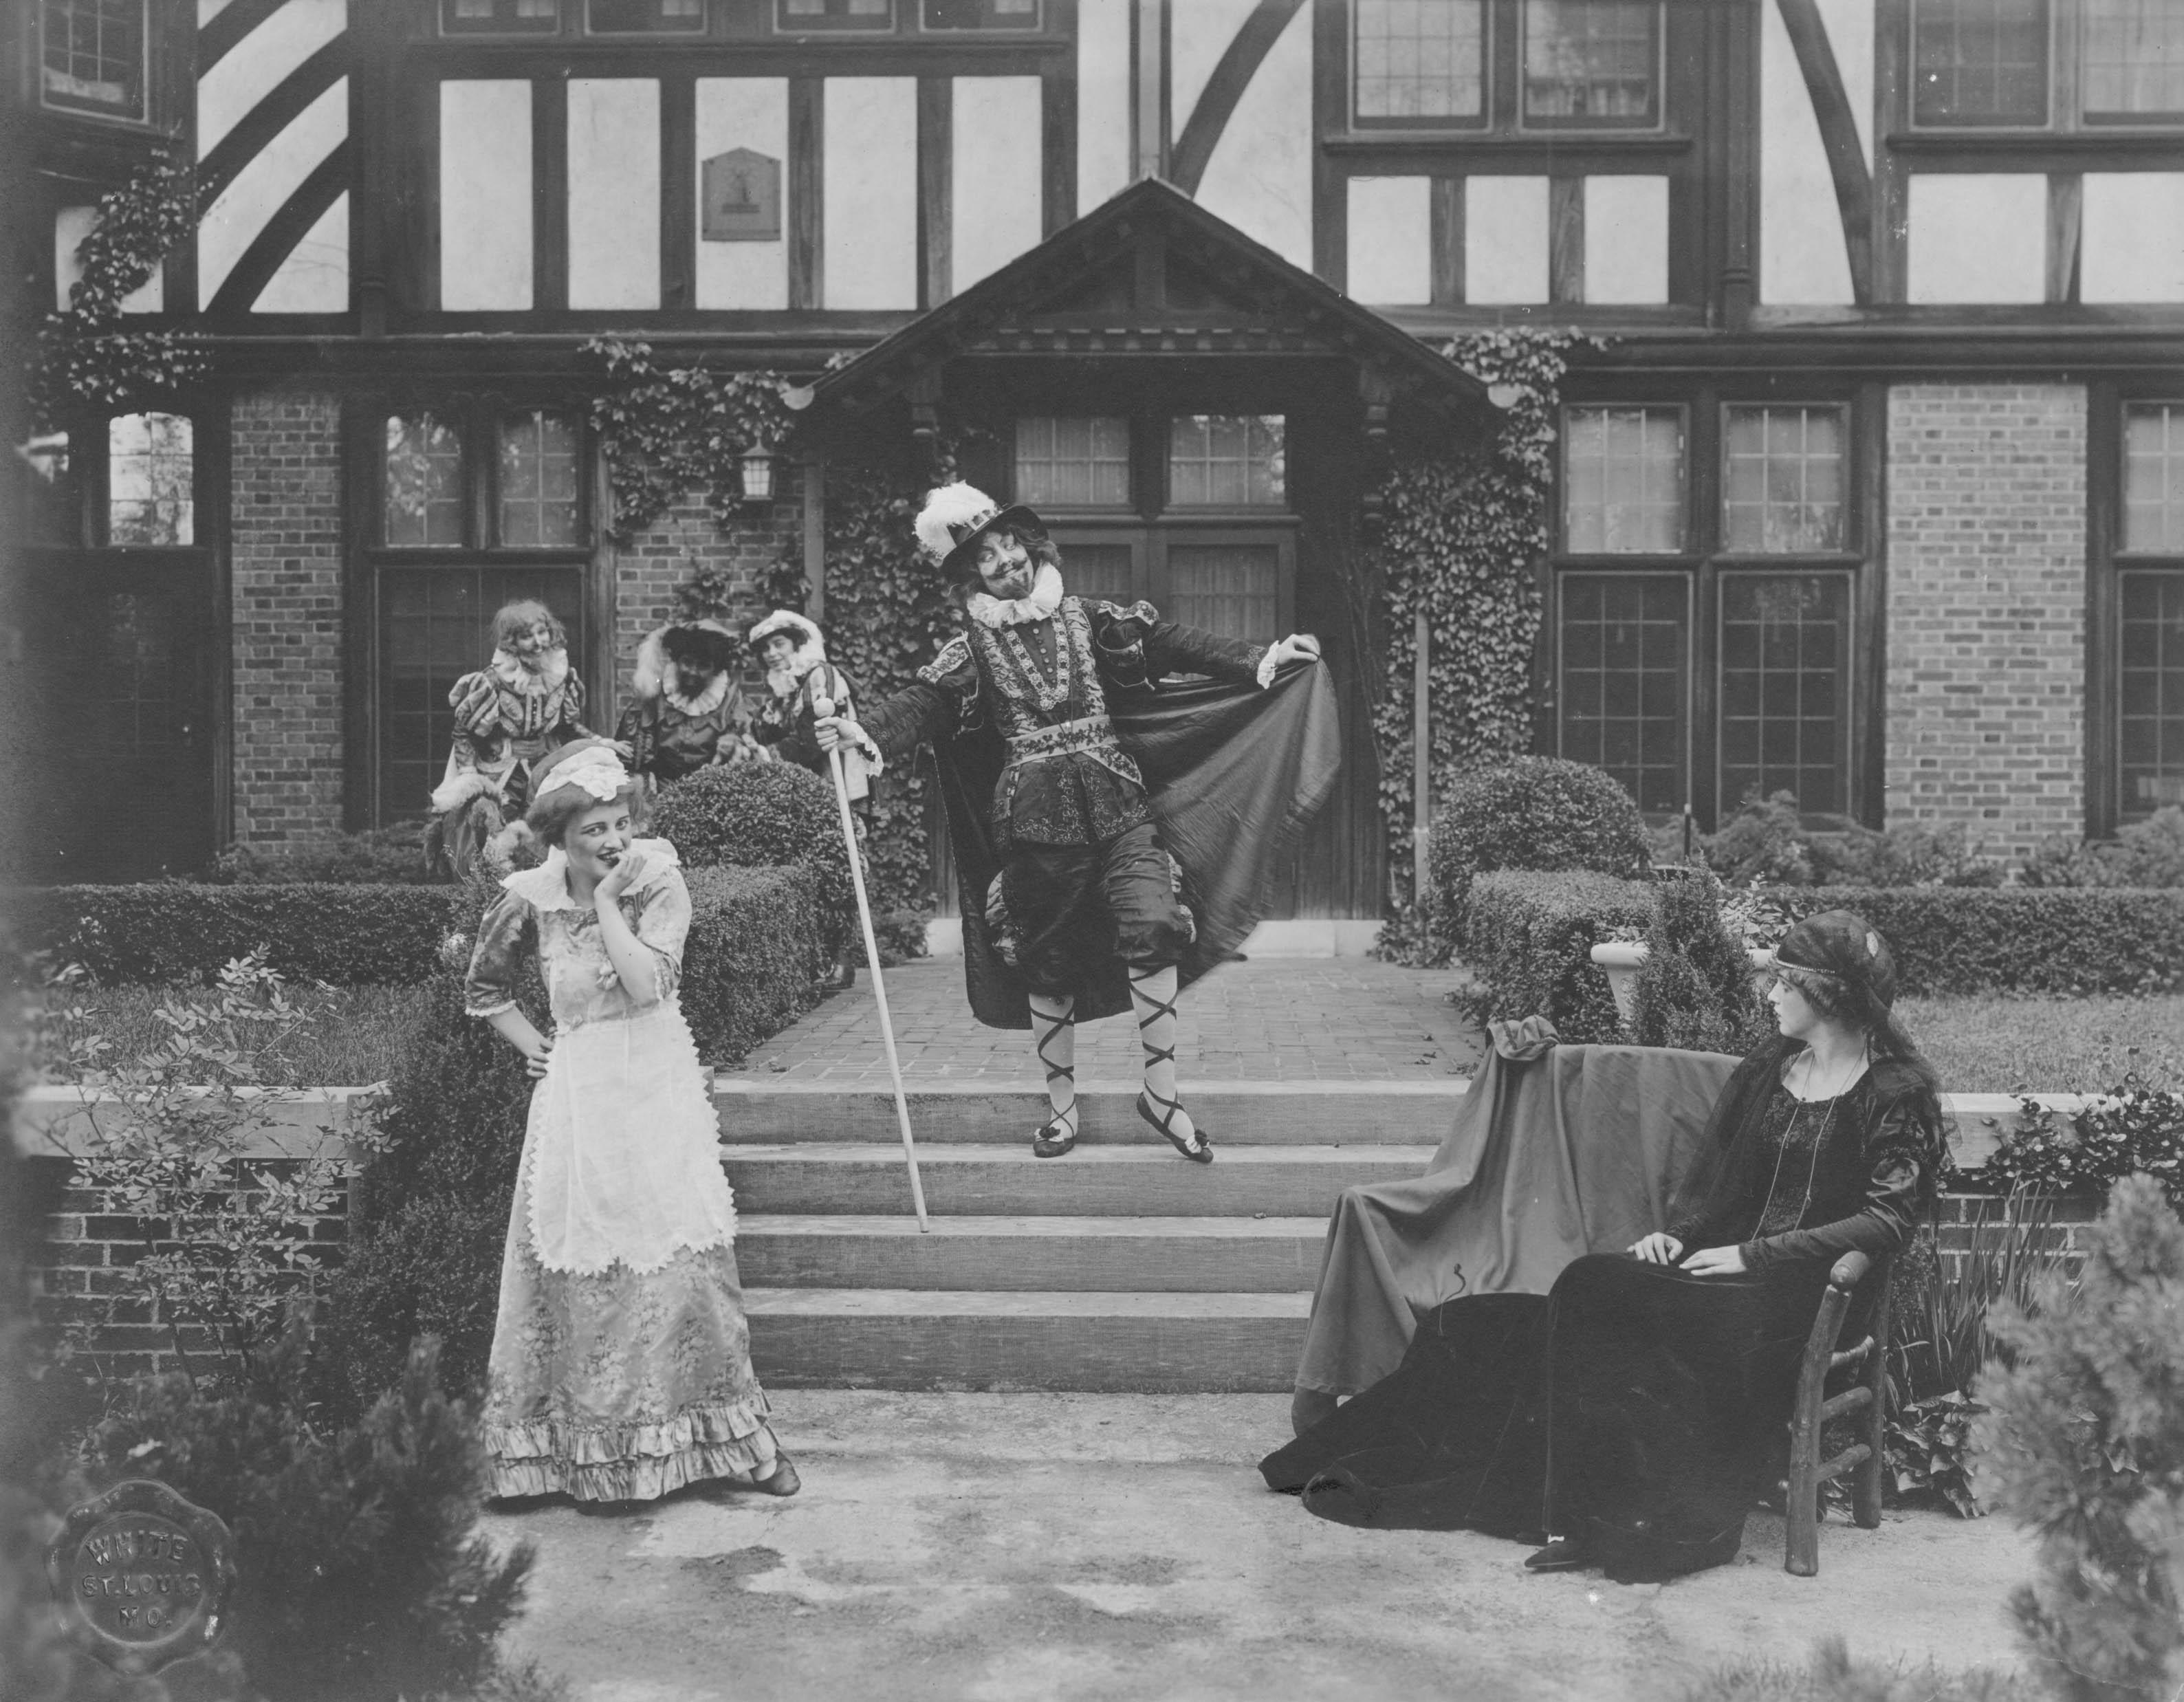 Scene from Twelfth Night